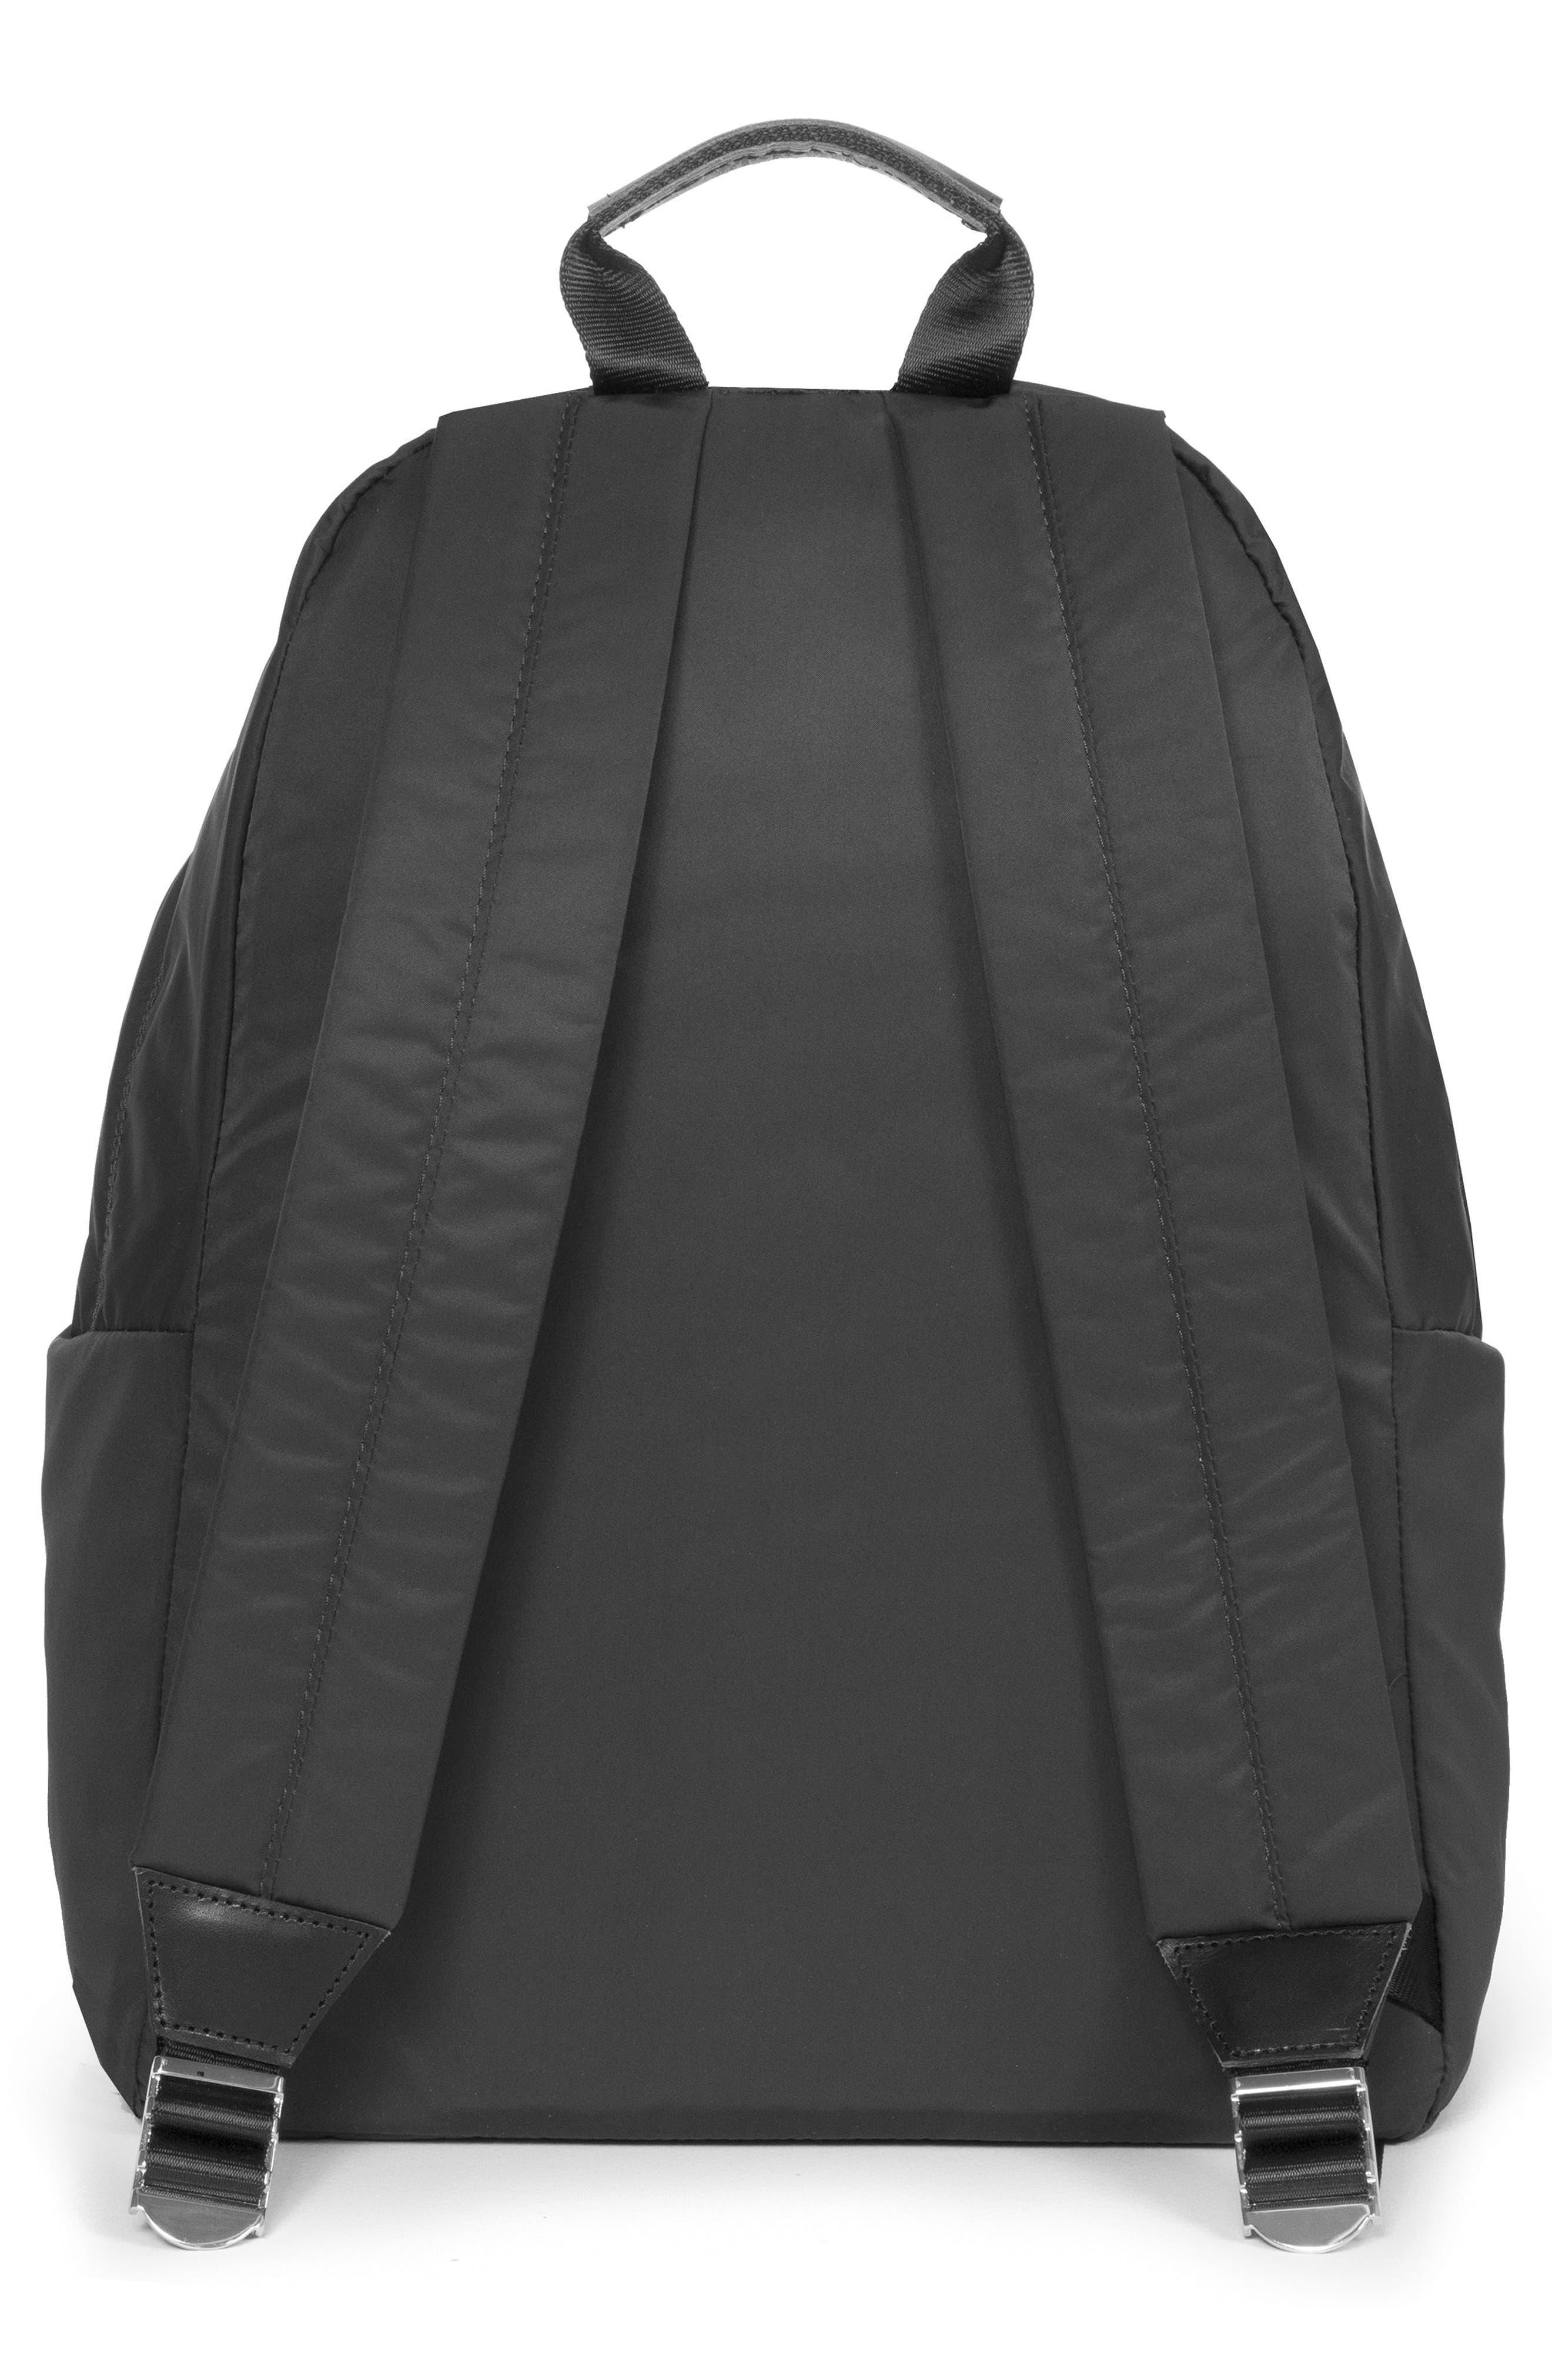 EASTPAK,                             Padded Doubl'r<sup>®</sup> Nylon Backpack,                             Alternate thumbnail 2, color,                             001